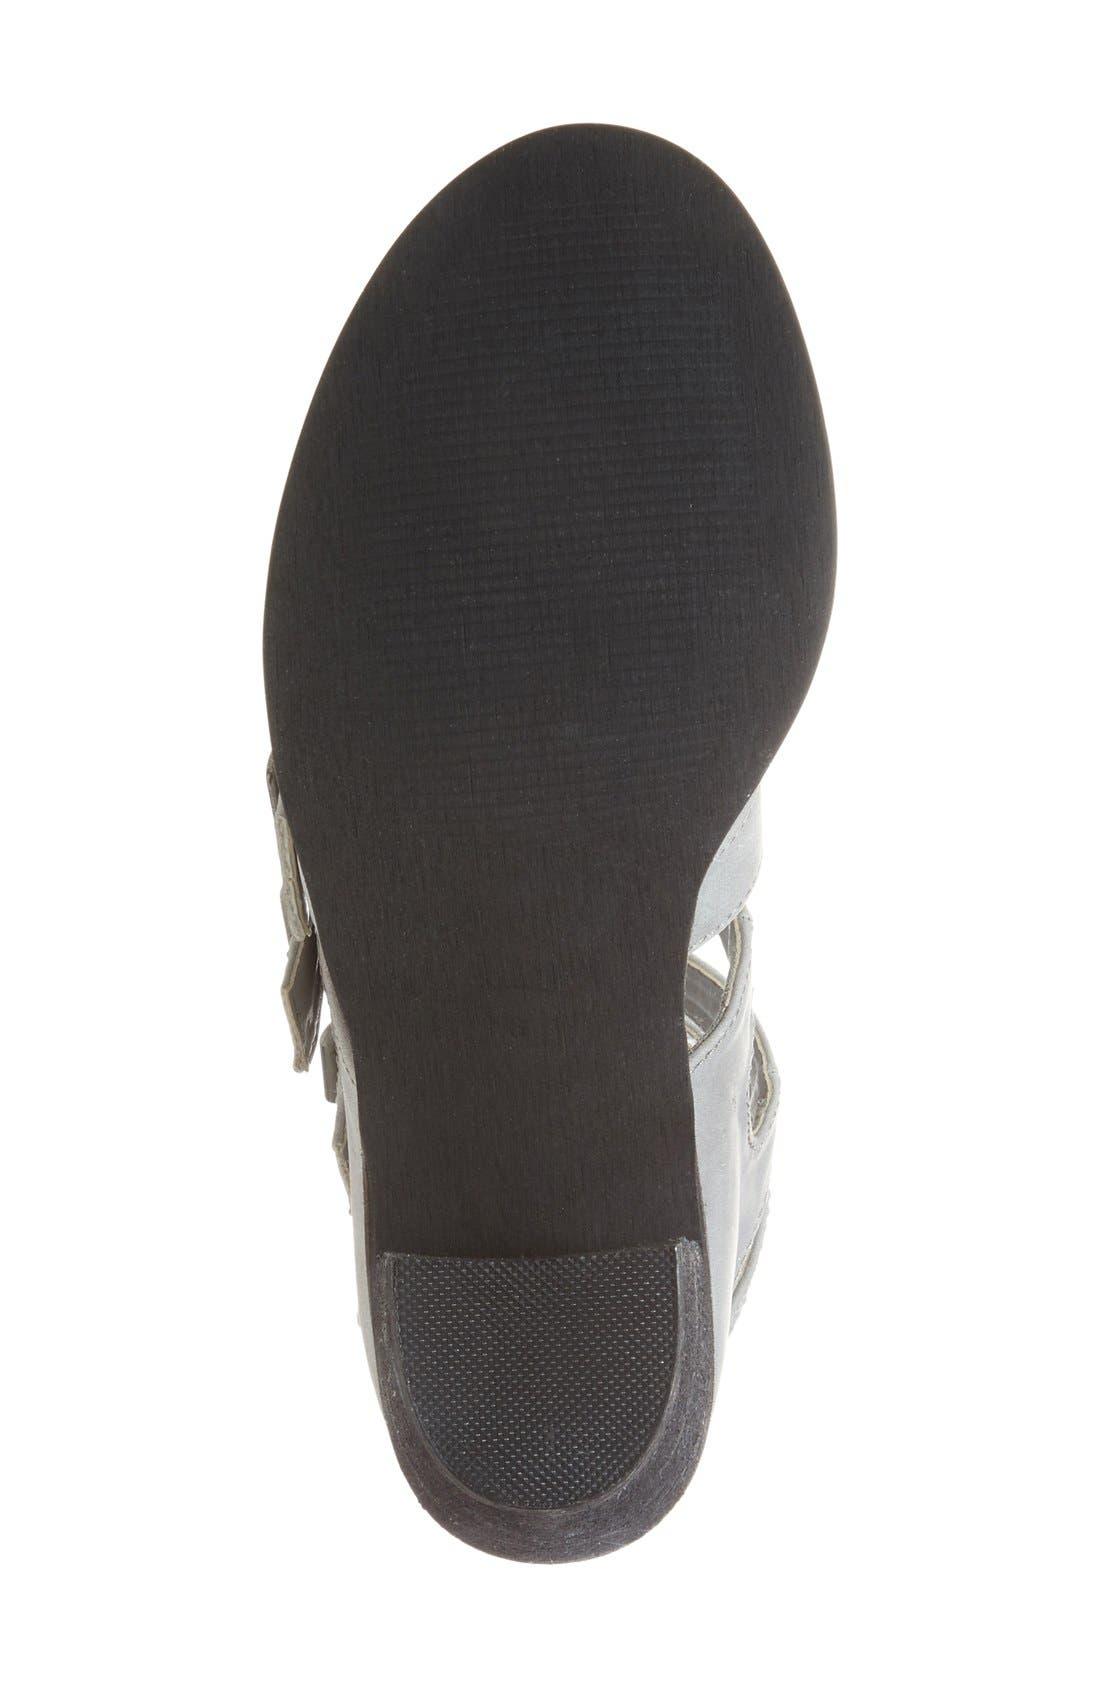 Alternate Image 4  - Rebels 'Yandy' Strappy Block Heel Sandal (Women)